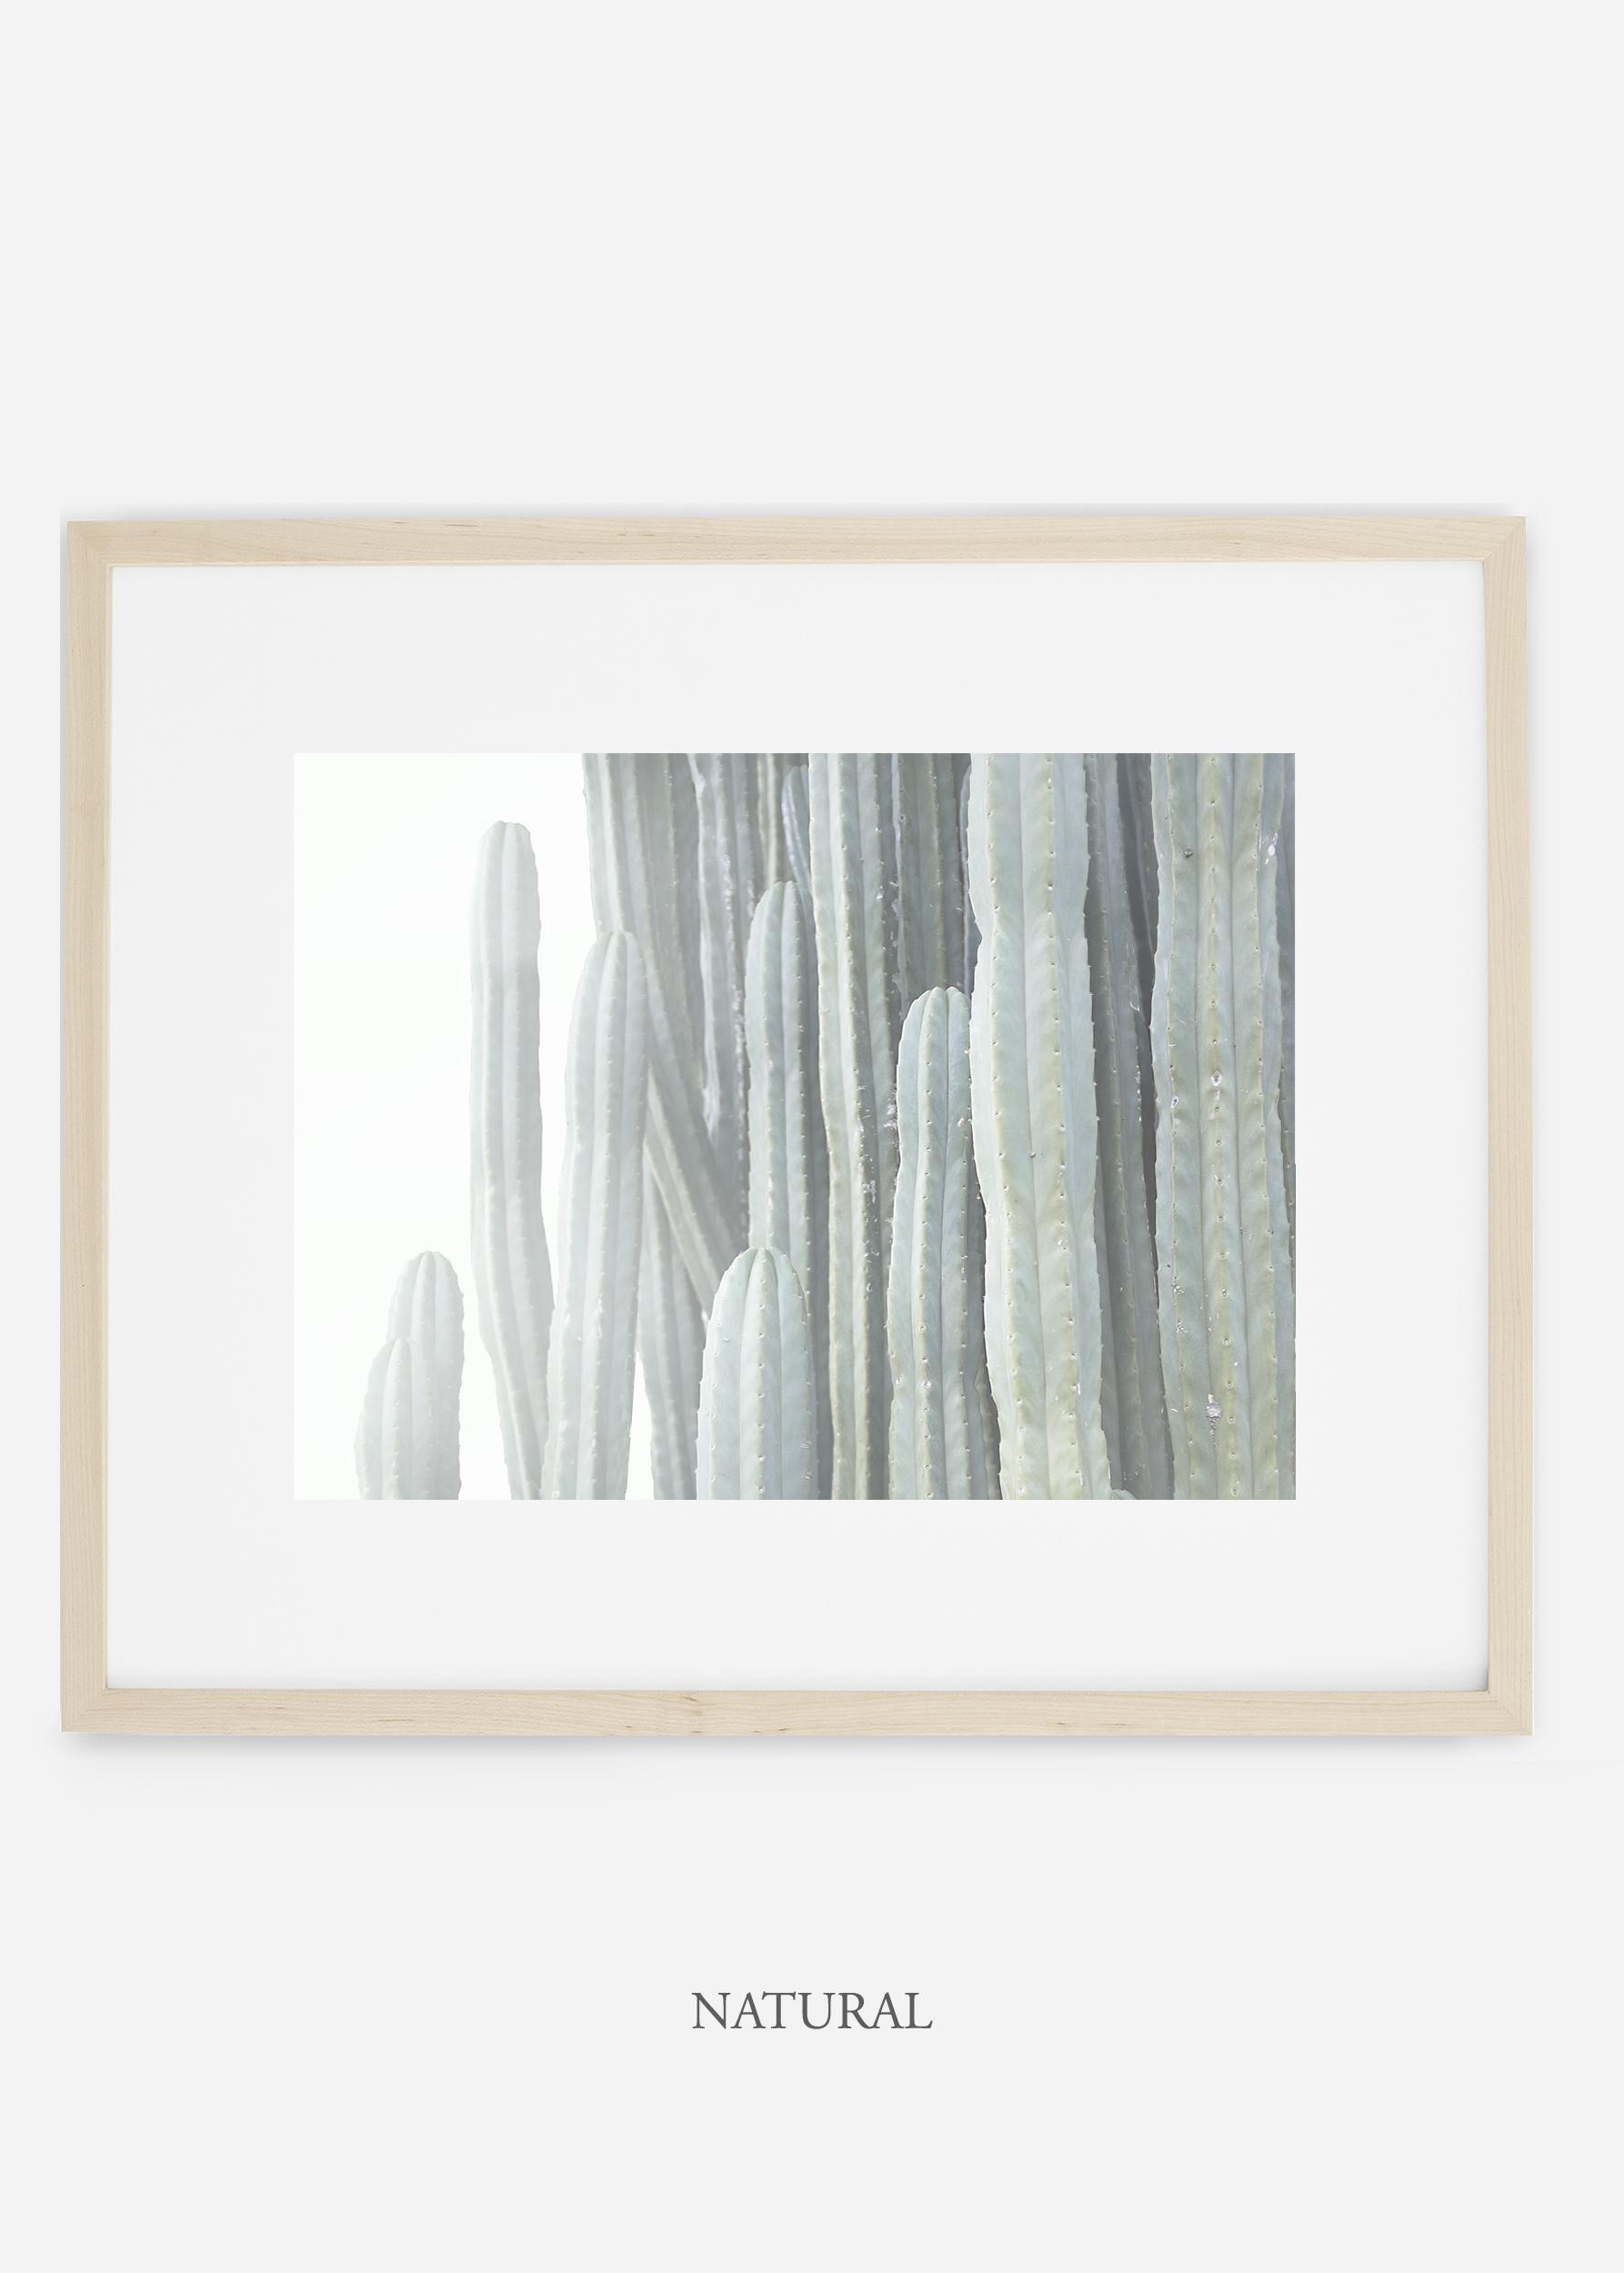 WilderCalifornia_naturalframe__Cactus_Art_Photography_interiordesign_white_bohemian_neutral_photography_photo.jpg